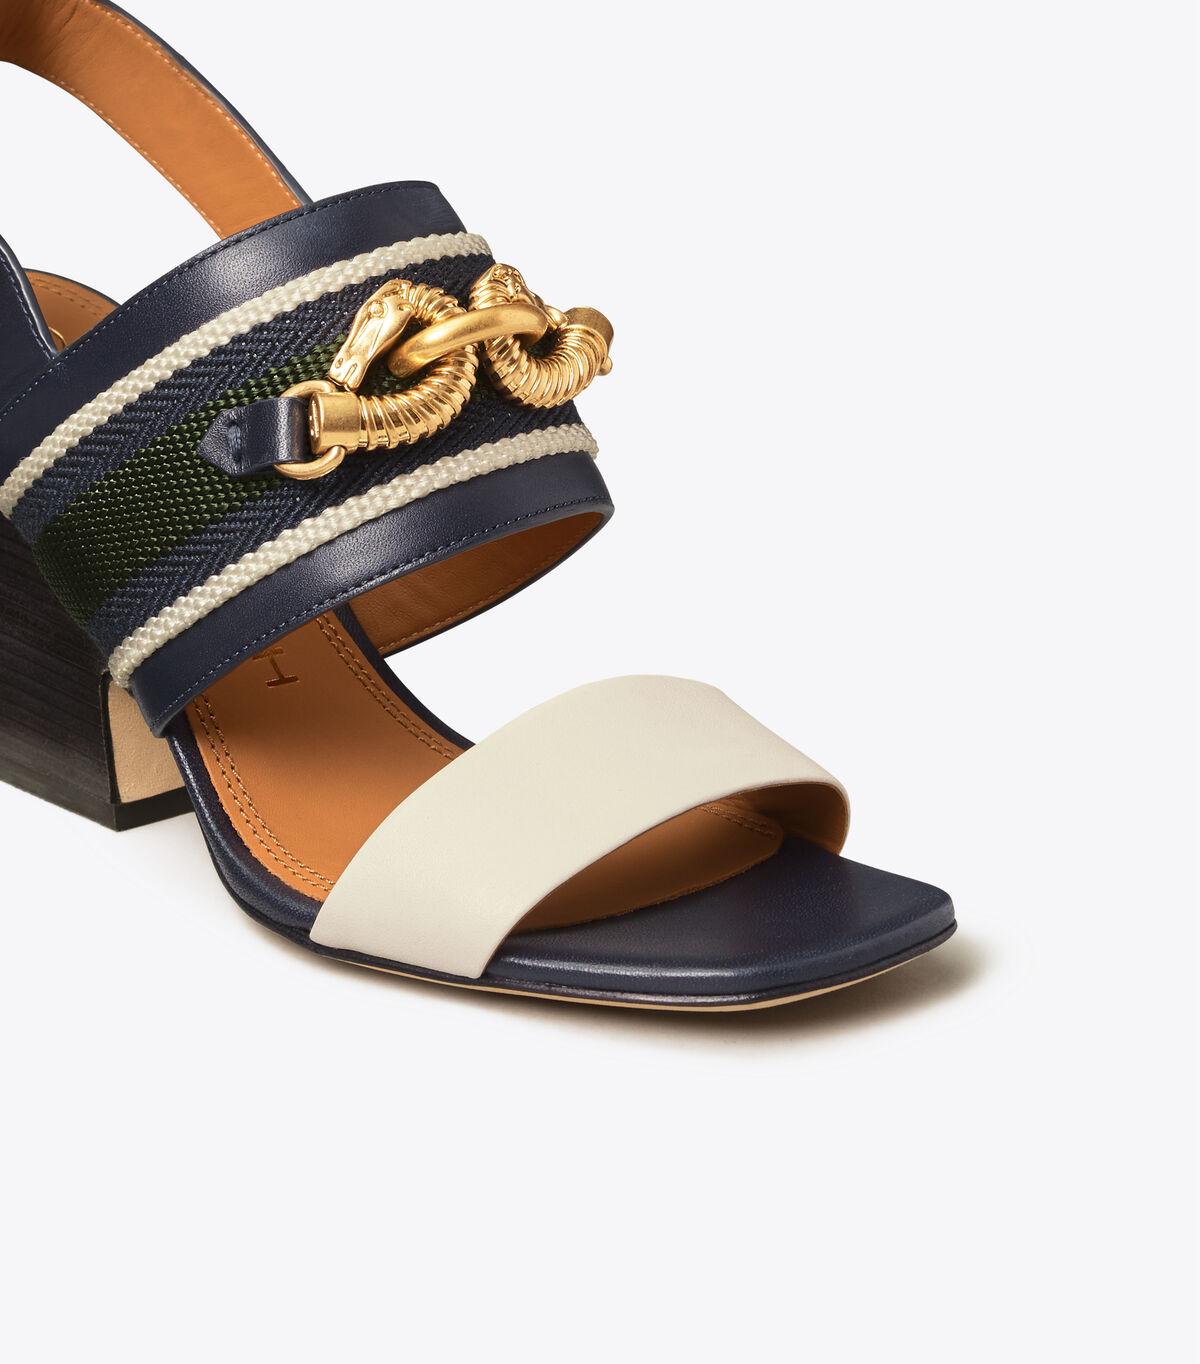 JESSA 75MM BLOCK HEEL SANDAL   400   Heeled Sandals